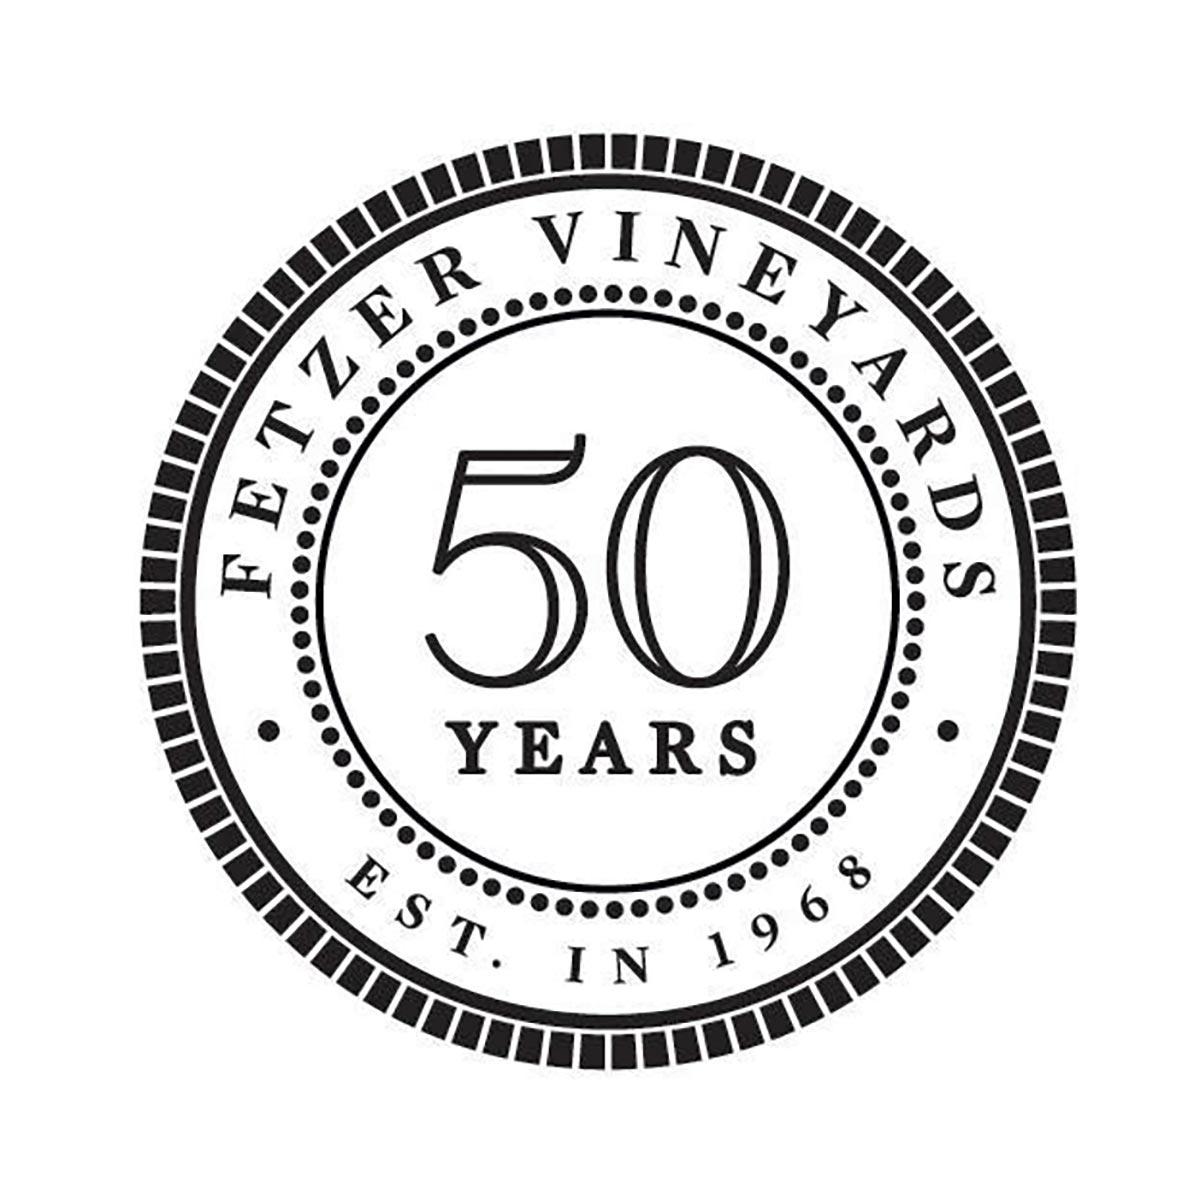 Fetzer Vineyards Earns Honor for Sustainability Efforts